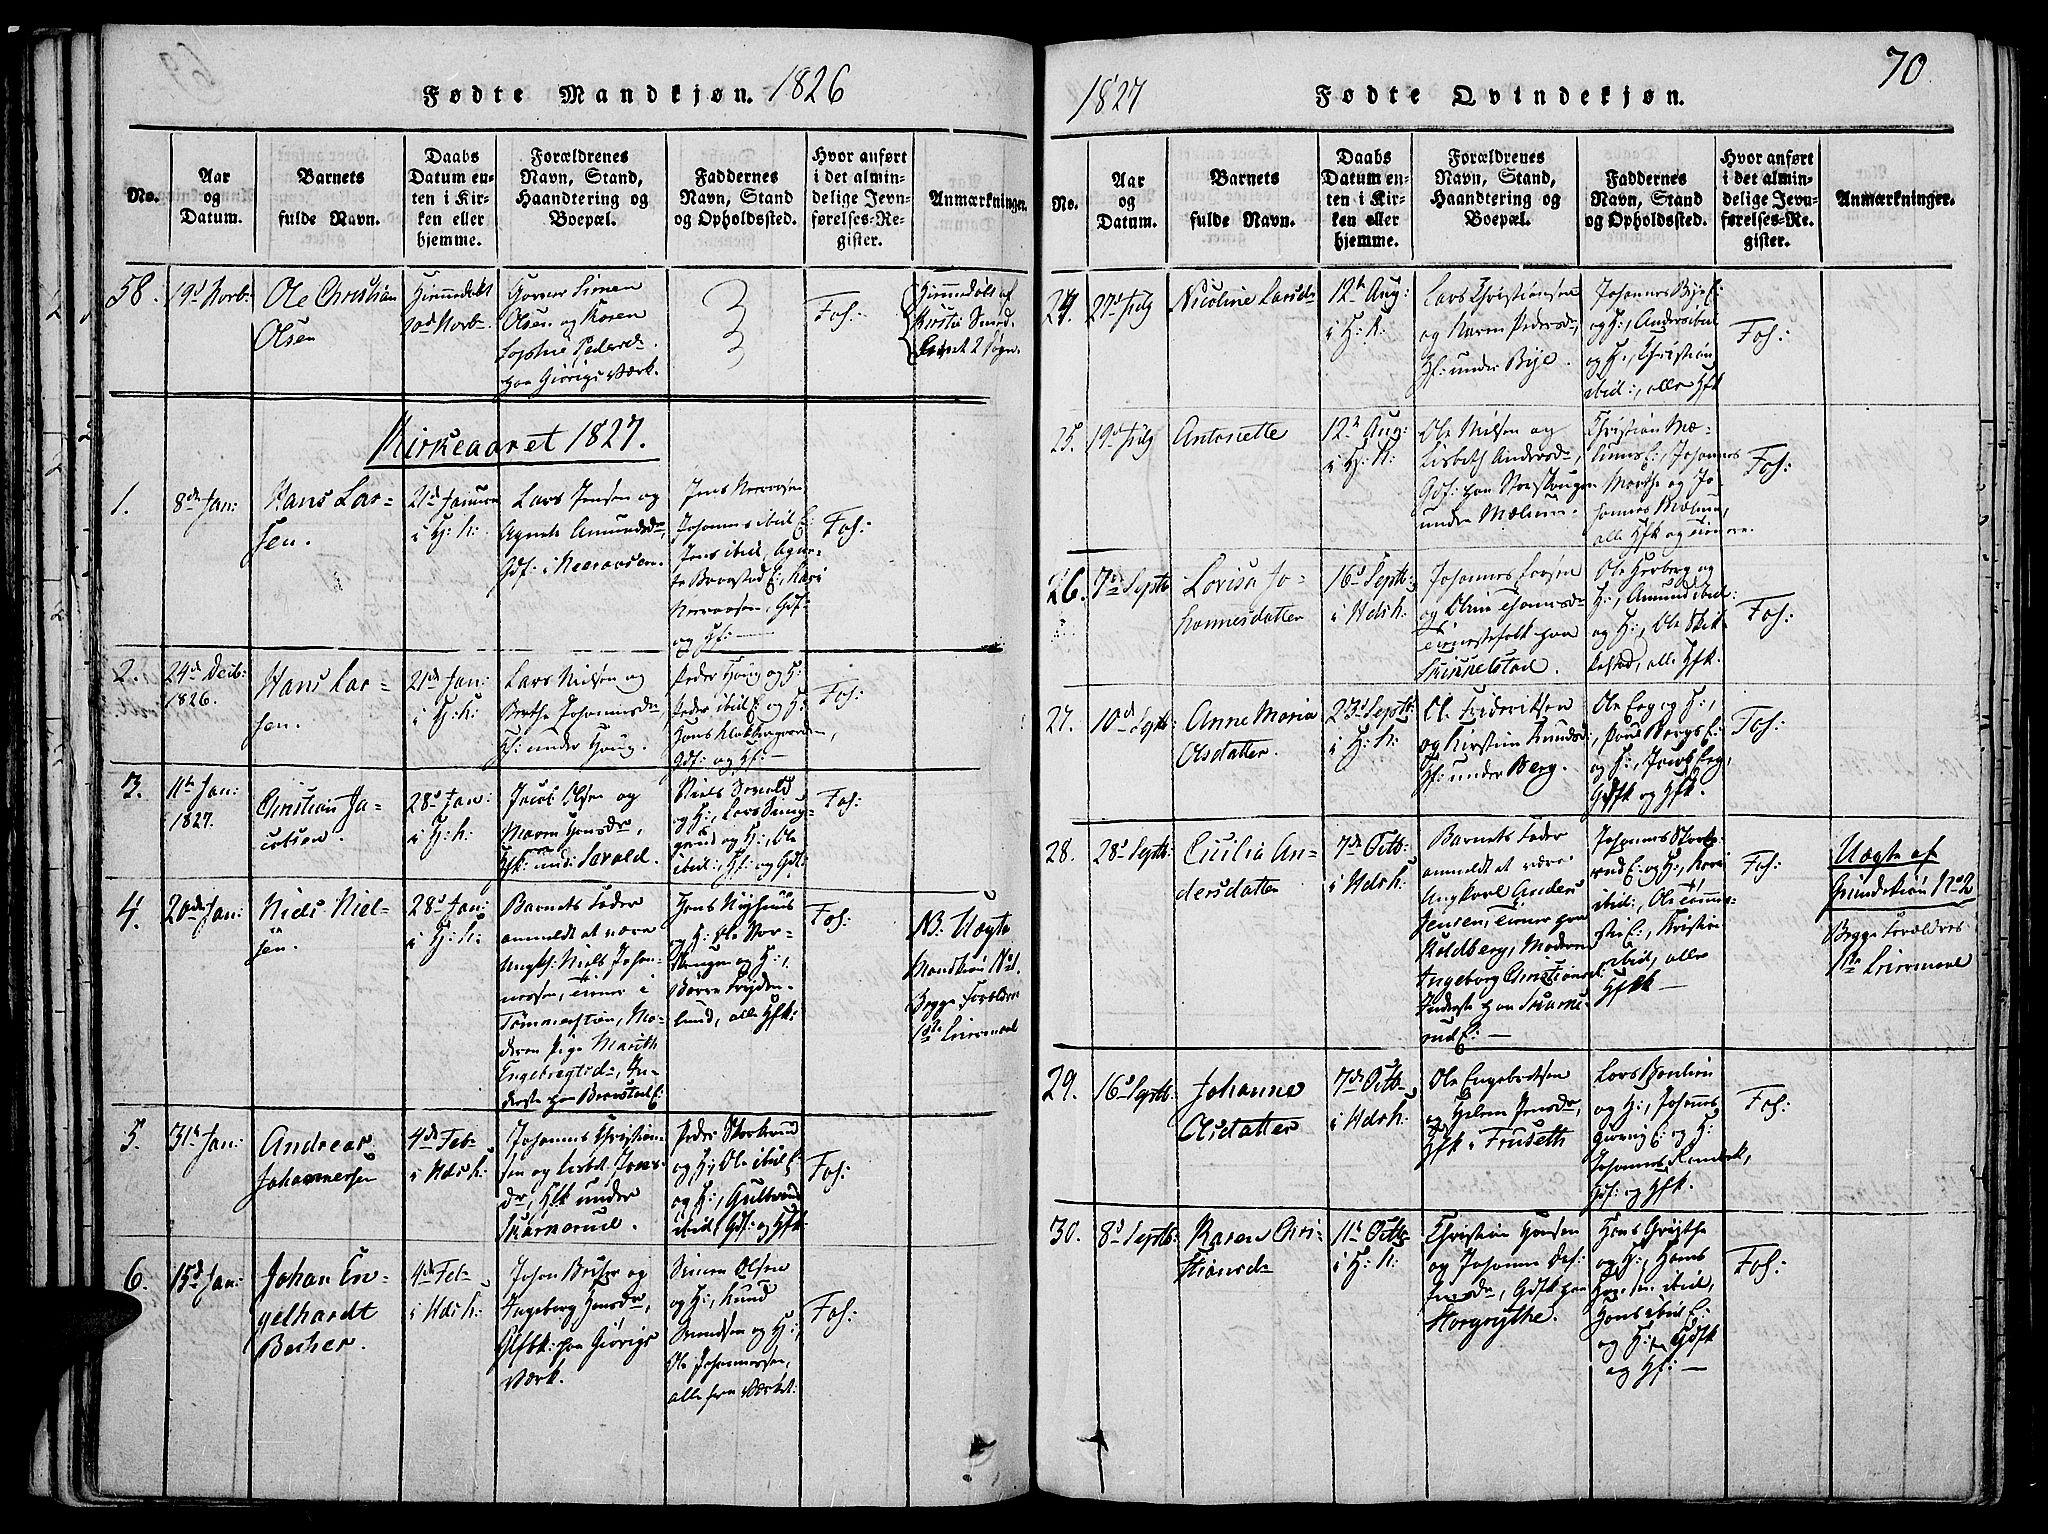 SAH, Vardal prestekontor, H/Ha/Haa/L0004: Ministerialbok nr. 4, 1814-1831, s. 70